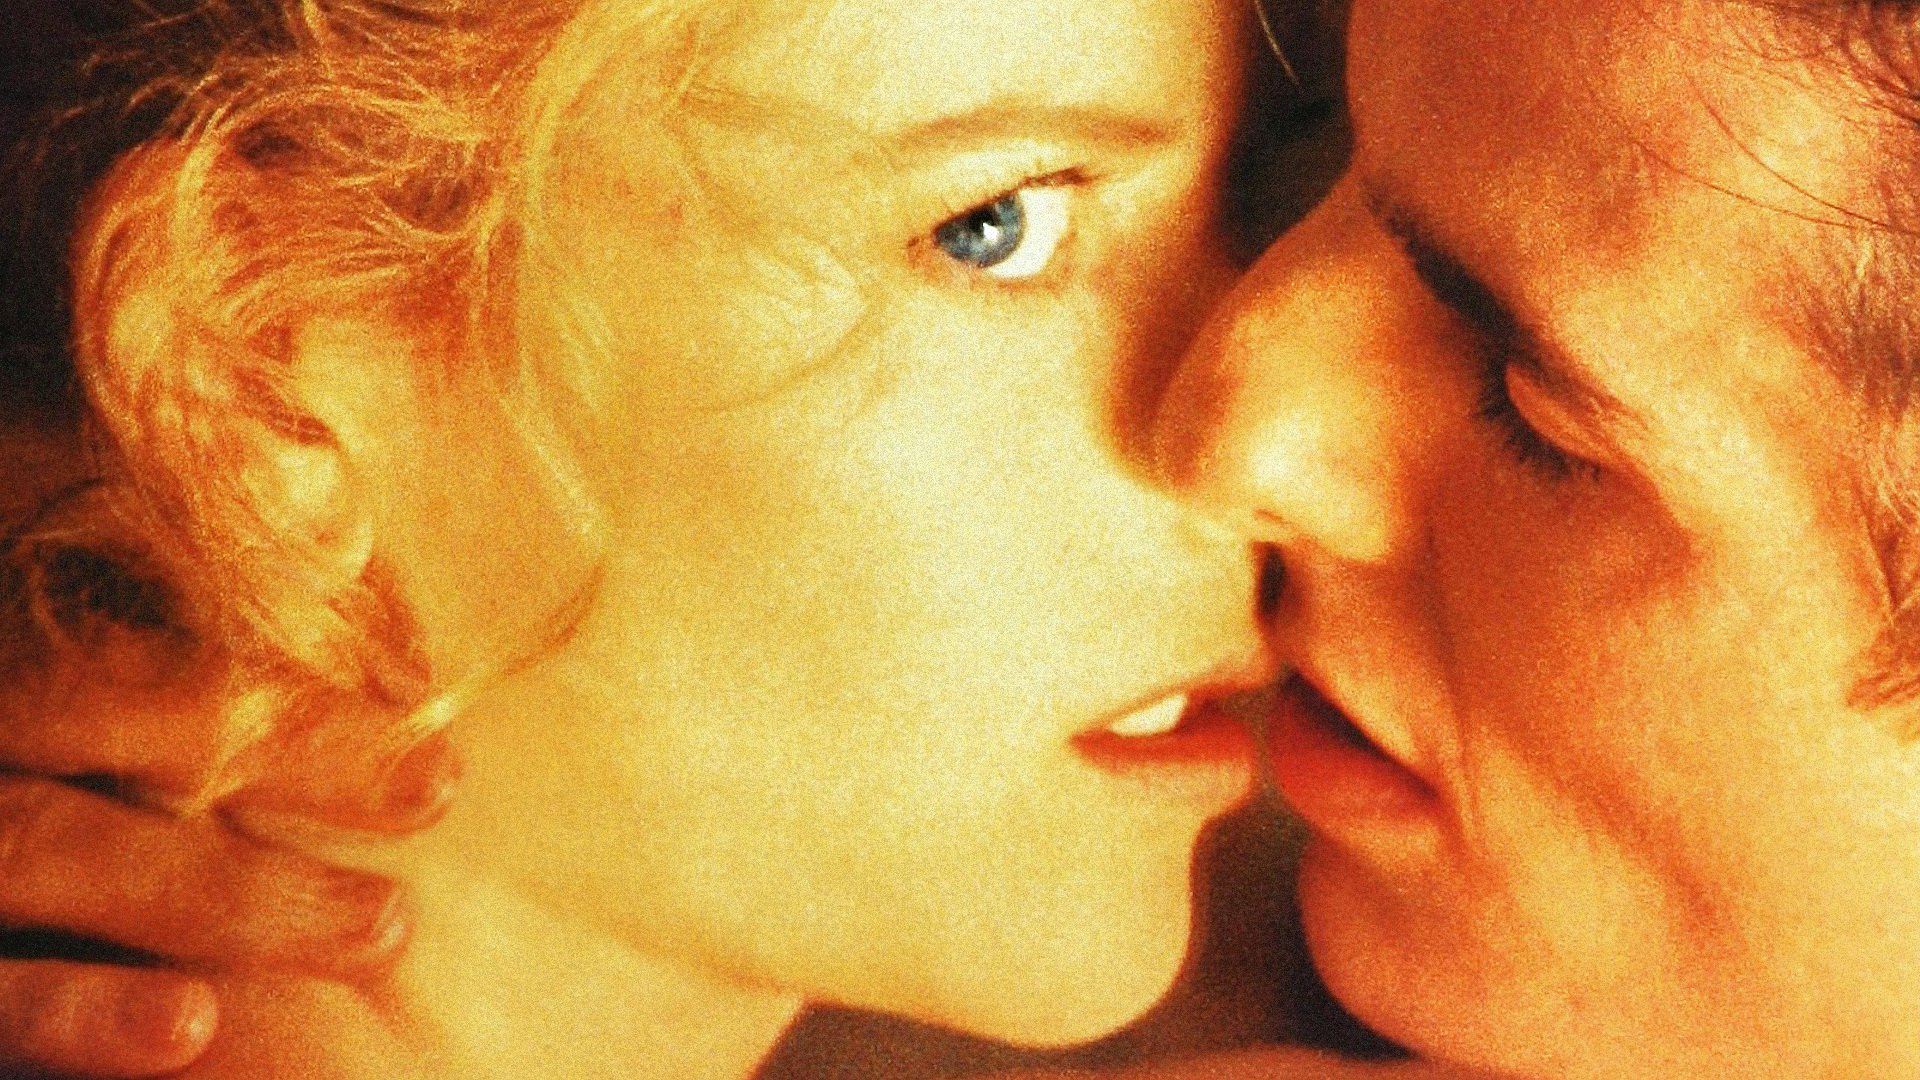 Eyes Wide Shut - Tom Cruise and Nicole Kidman